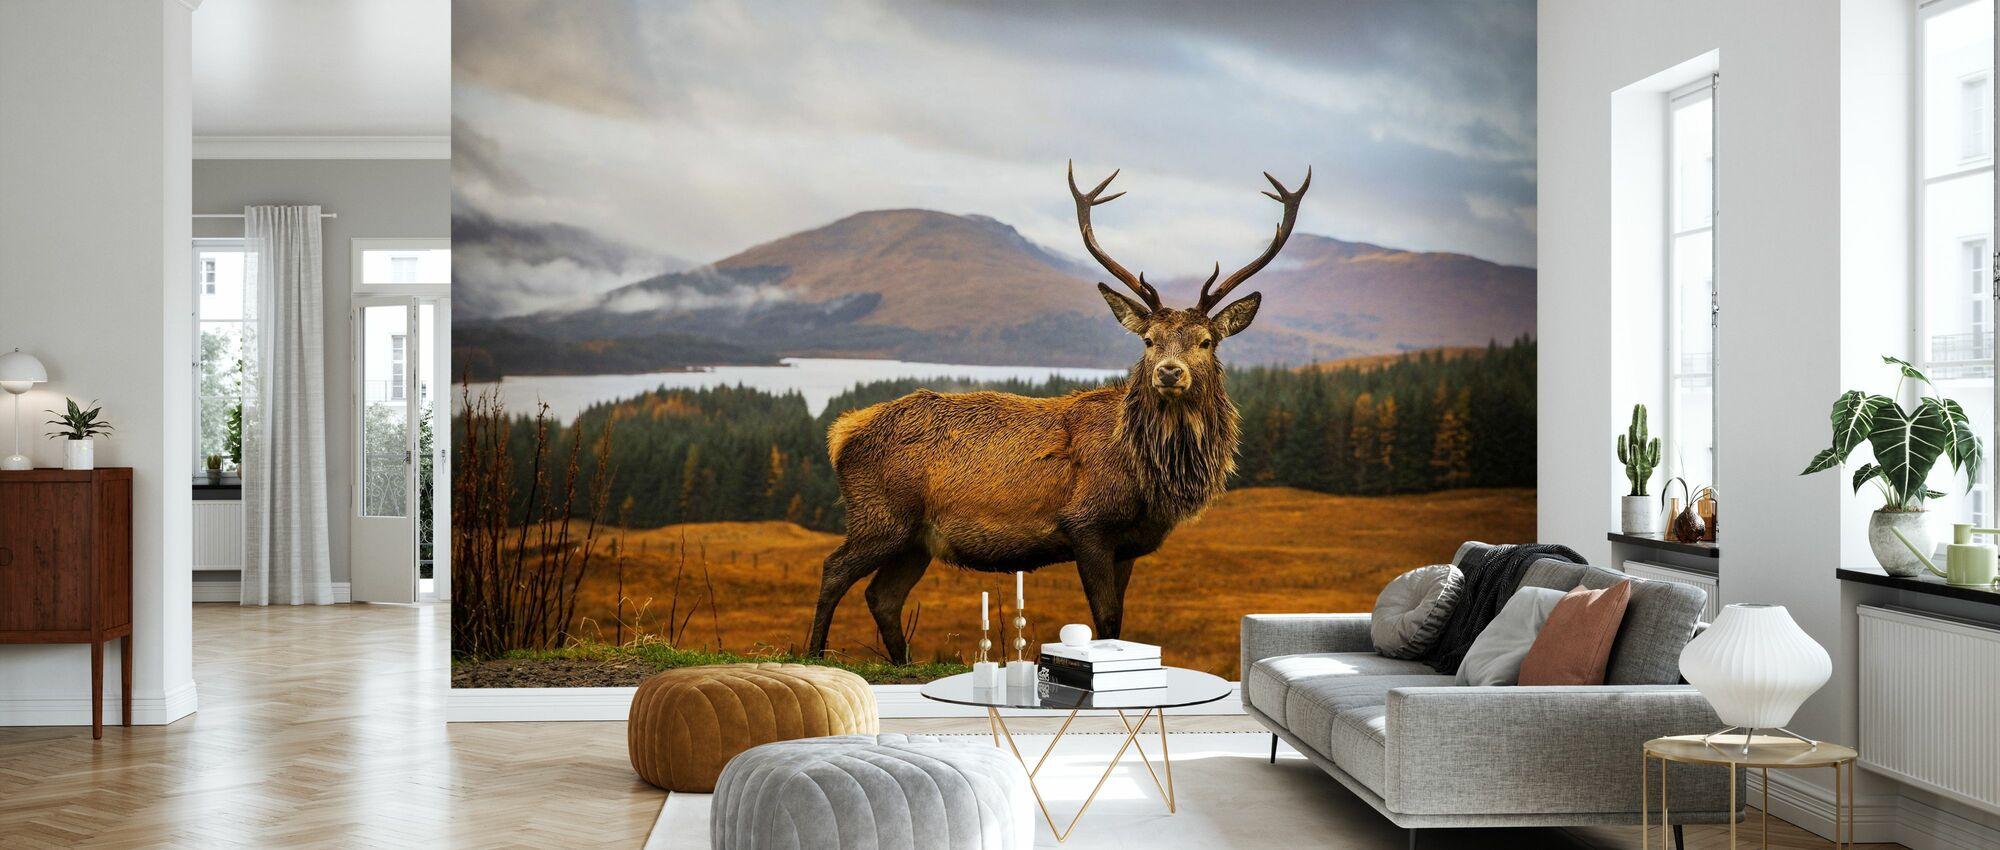 Schotse hert - Behang - Woonkamer